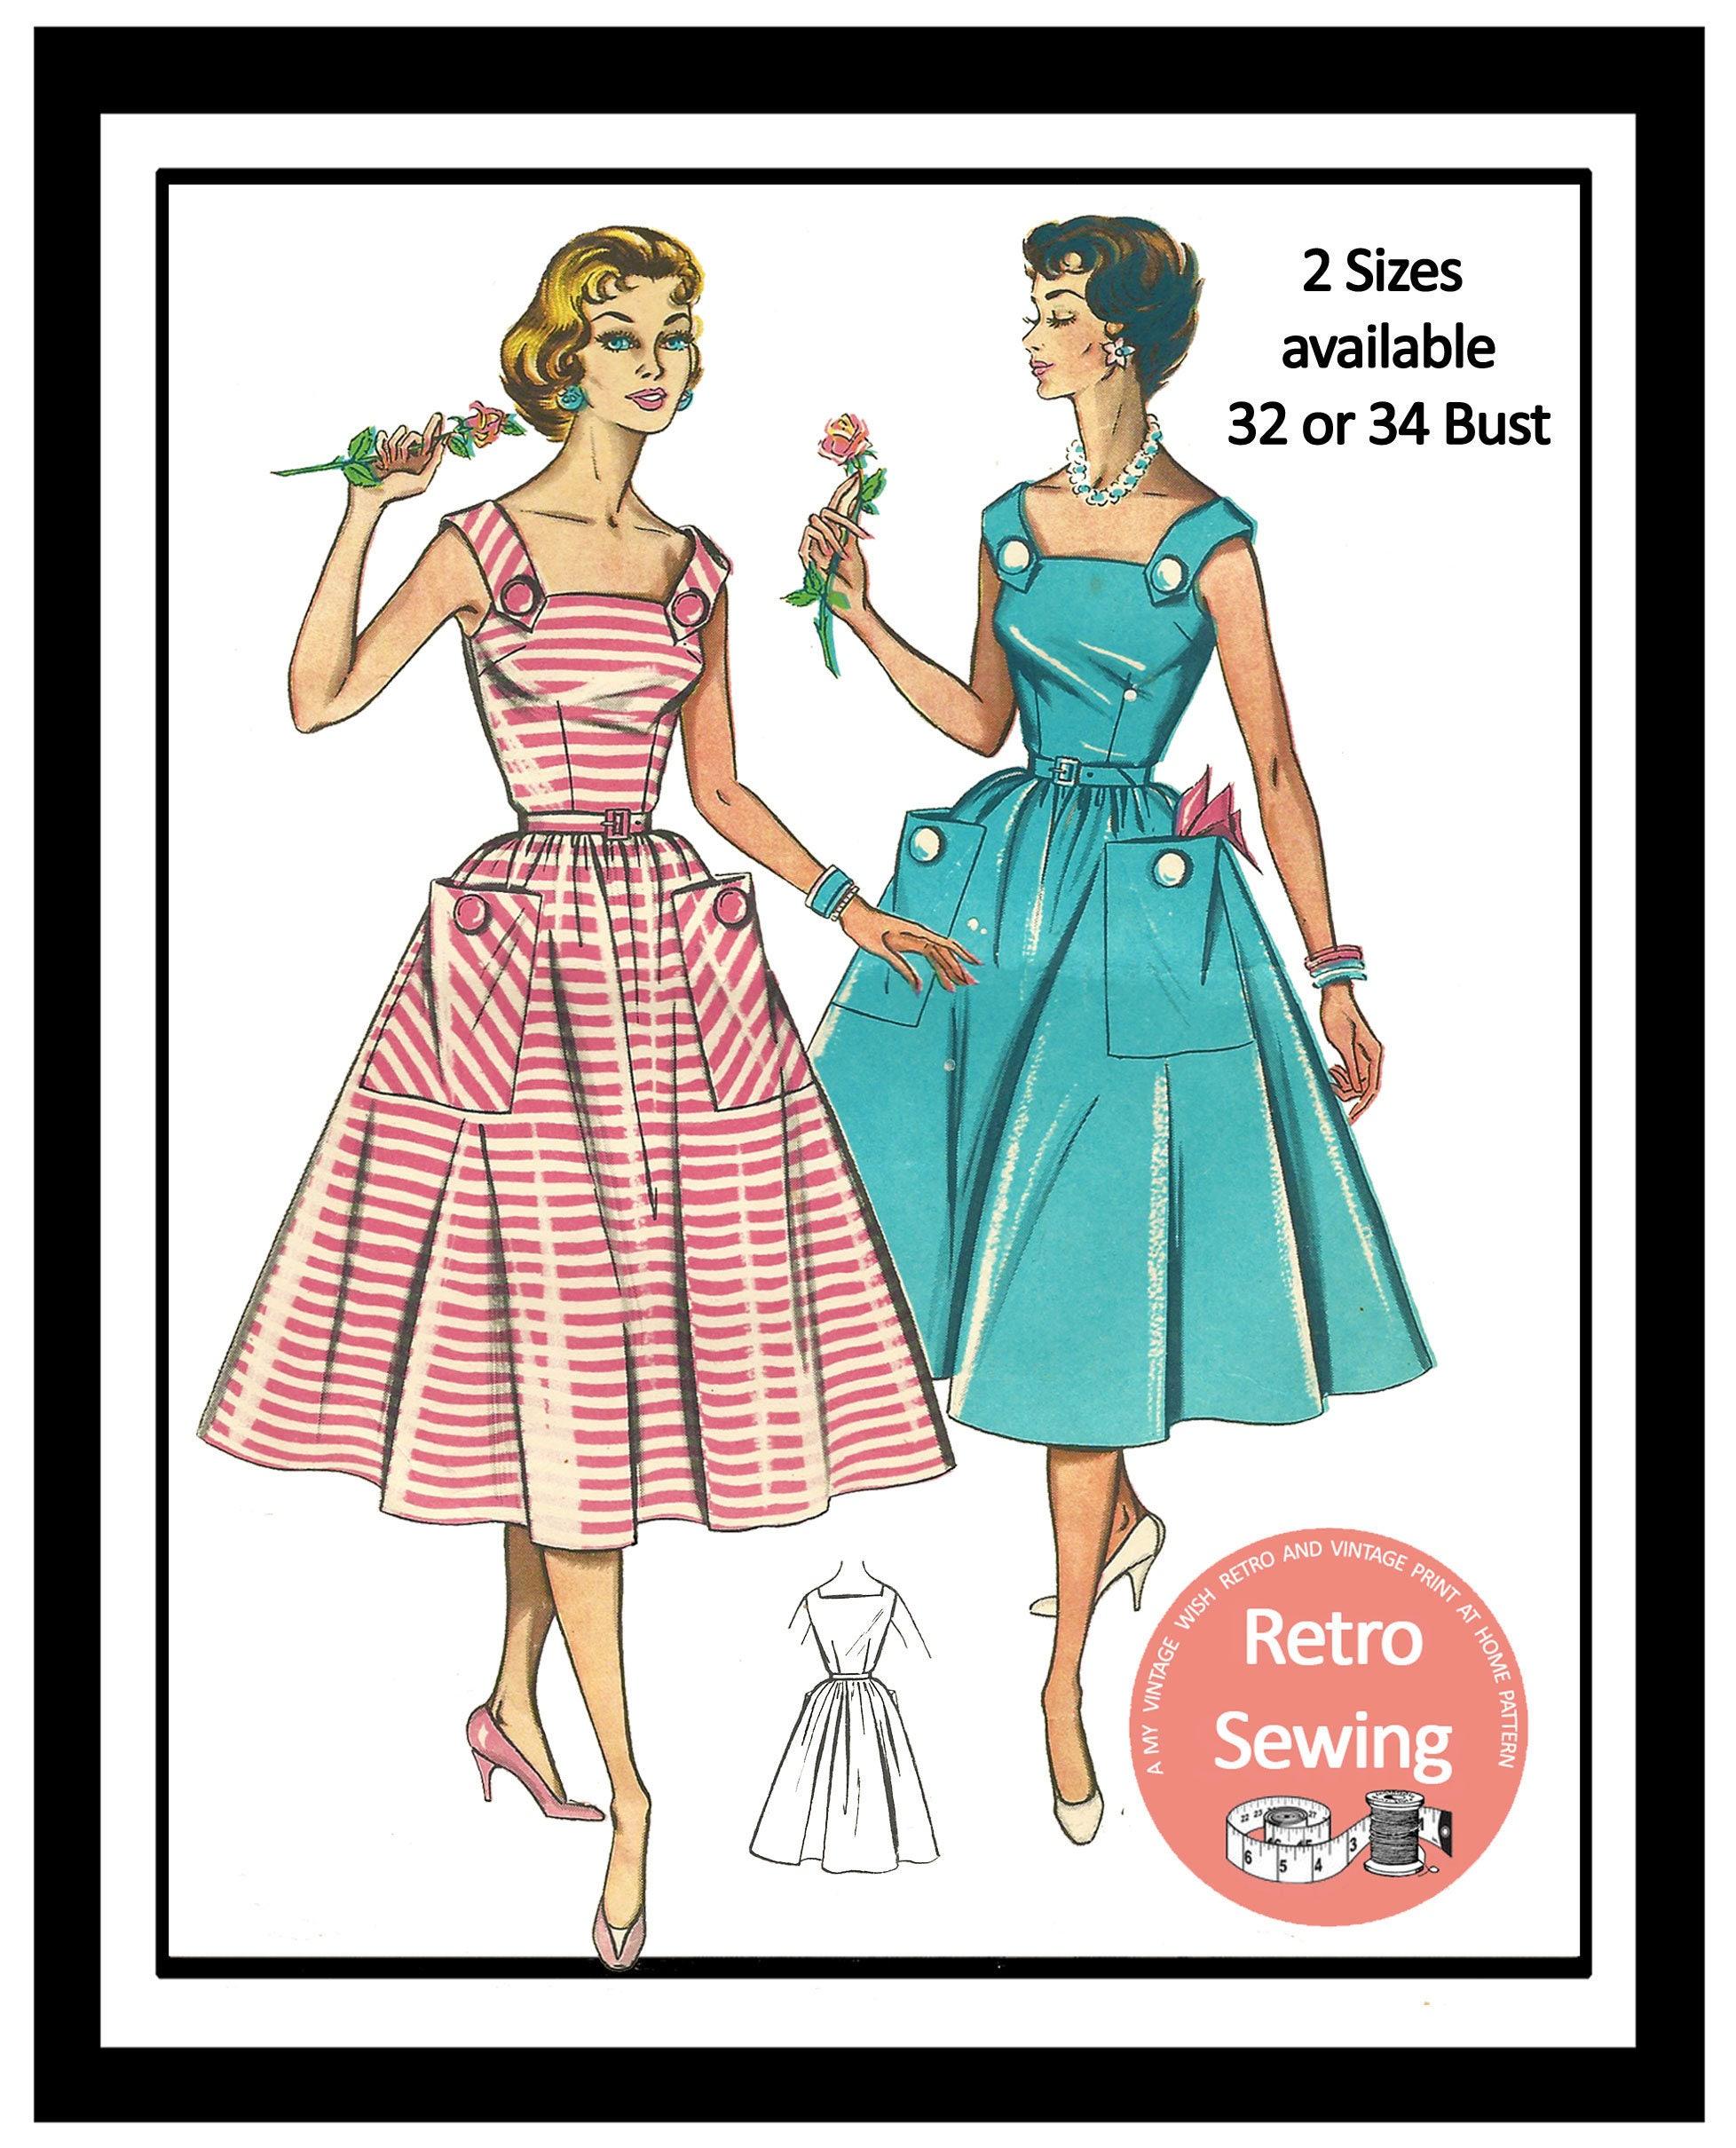 patron de couture robe d t rockabilly ann es 1950 pin up etsy. Black Bedroom Furniture Sets. Home Design Ideas